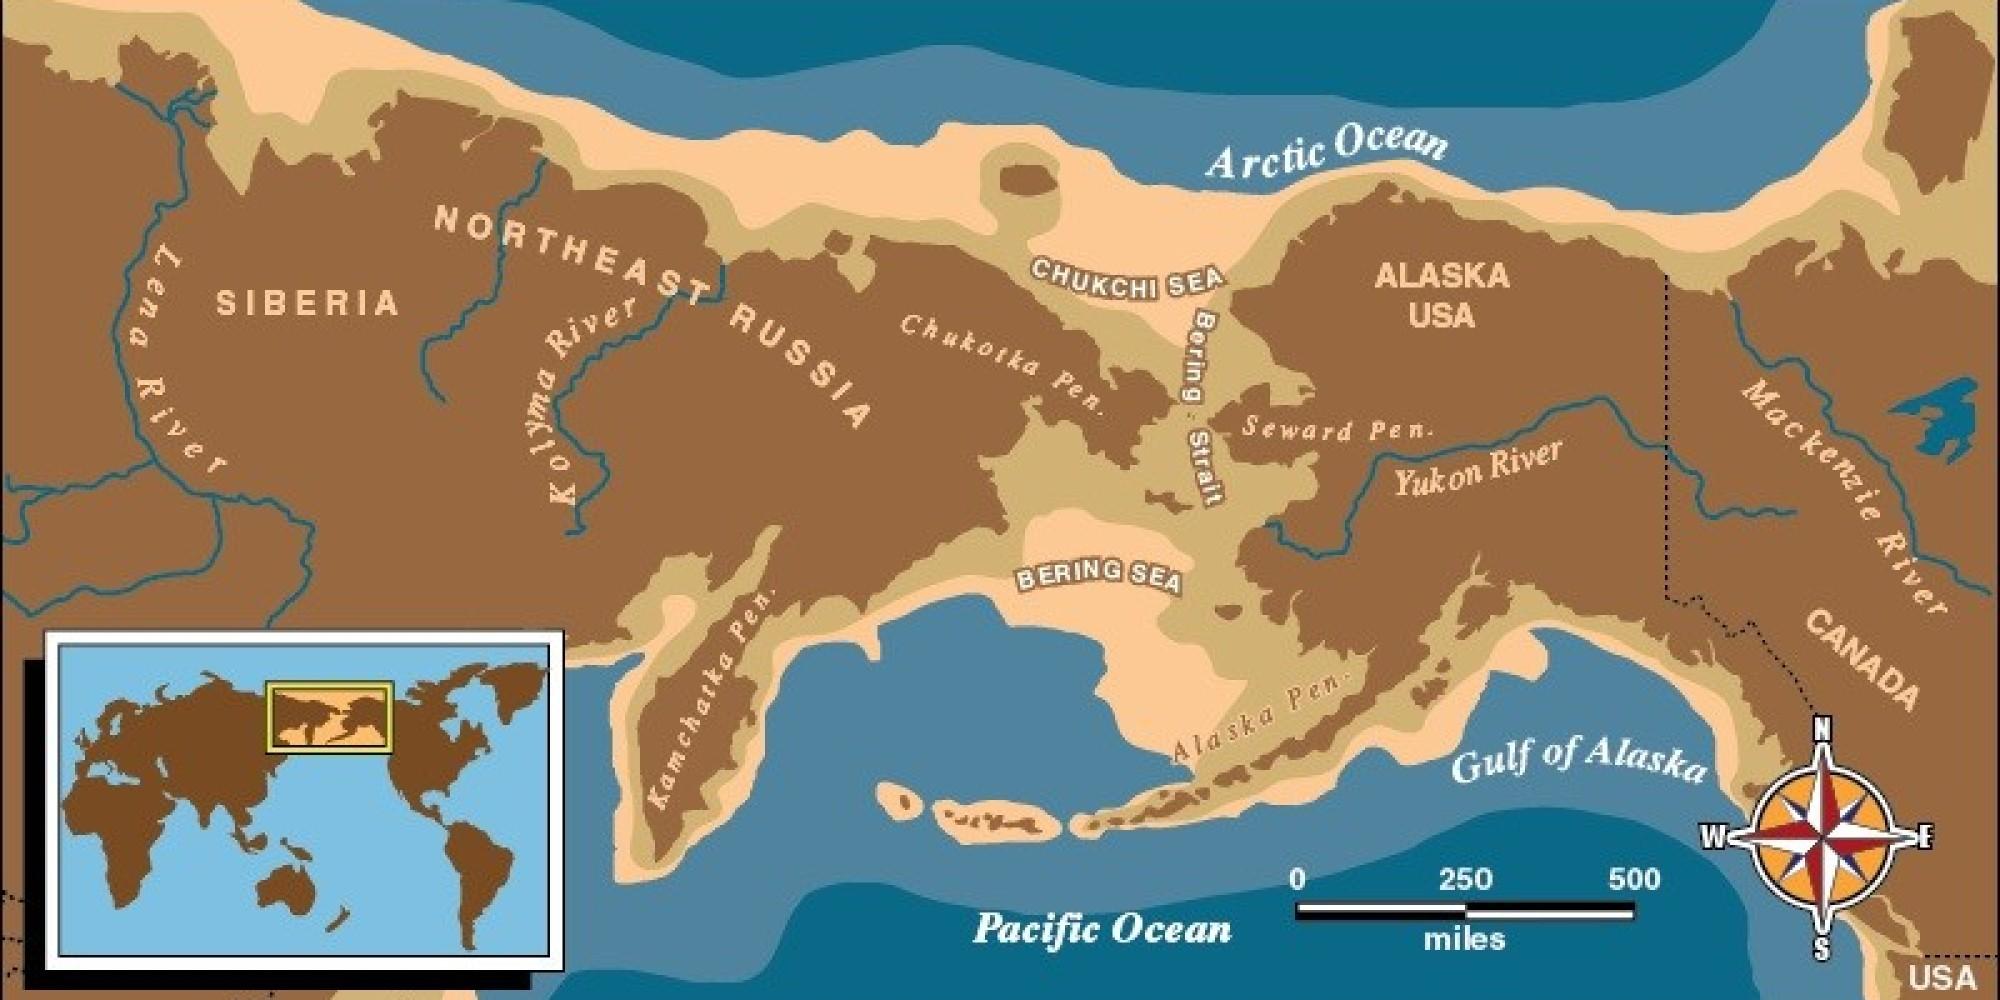 The Bering Land Bridge Theory